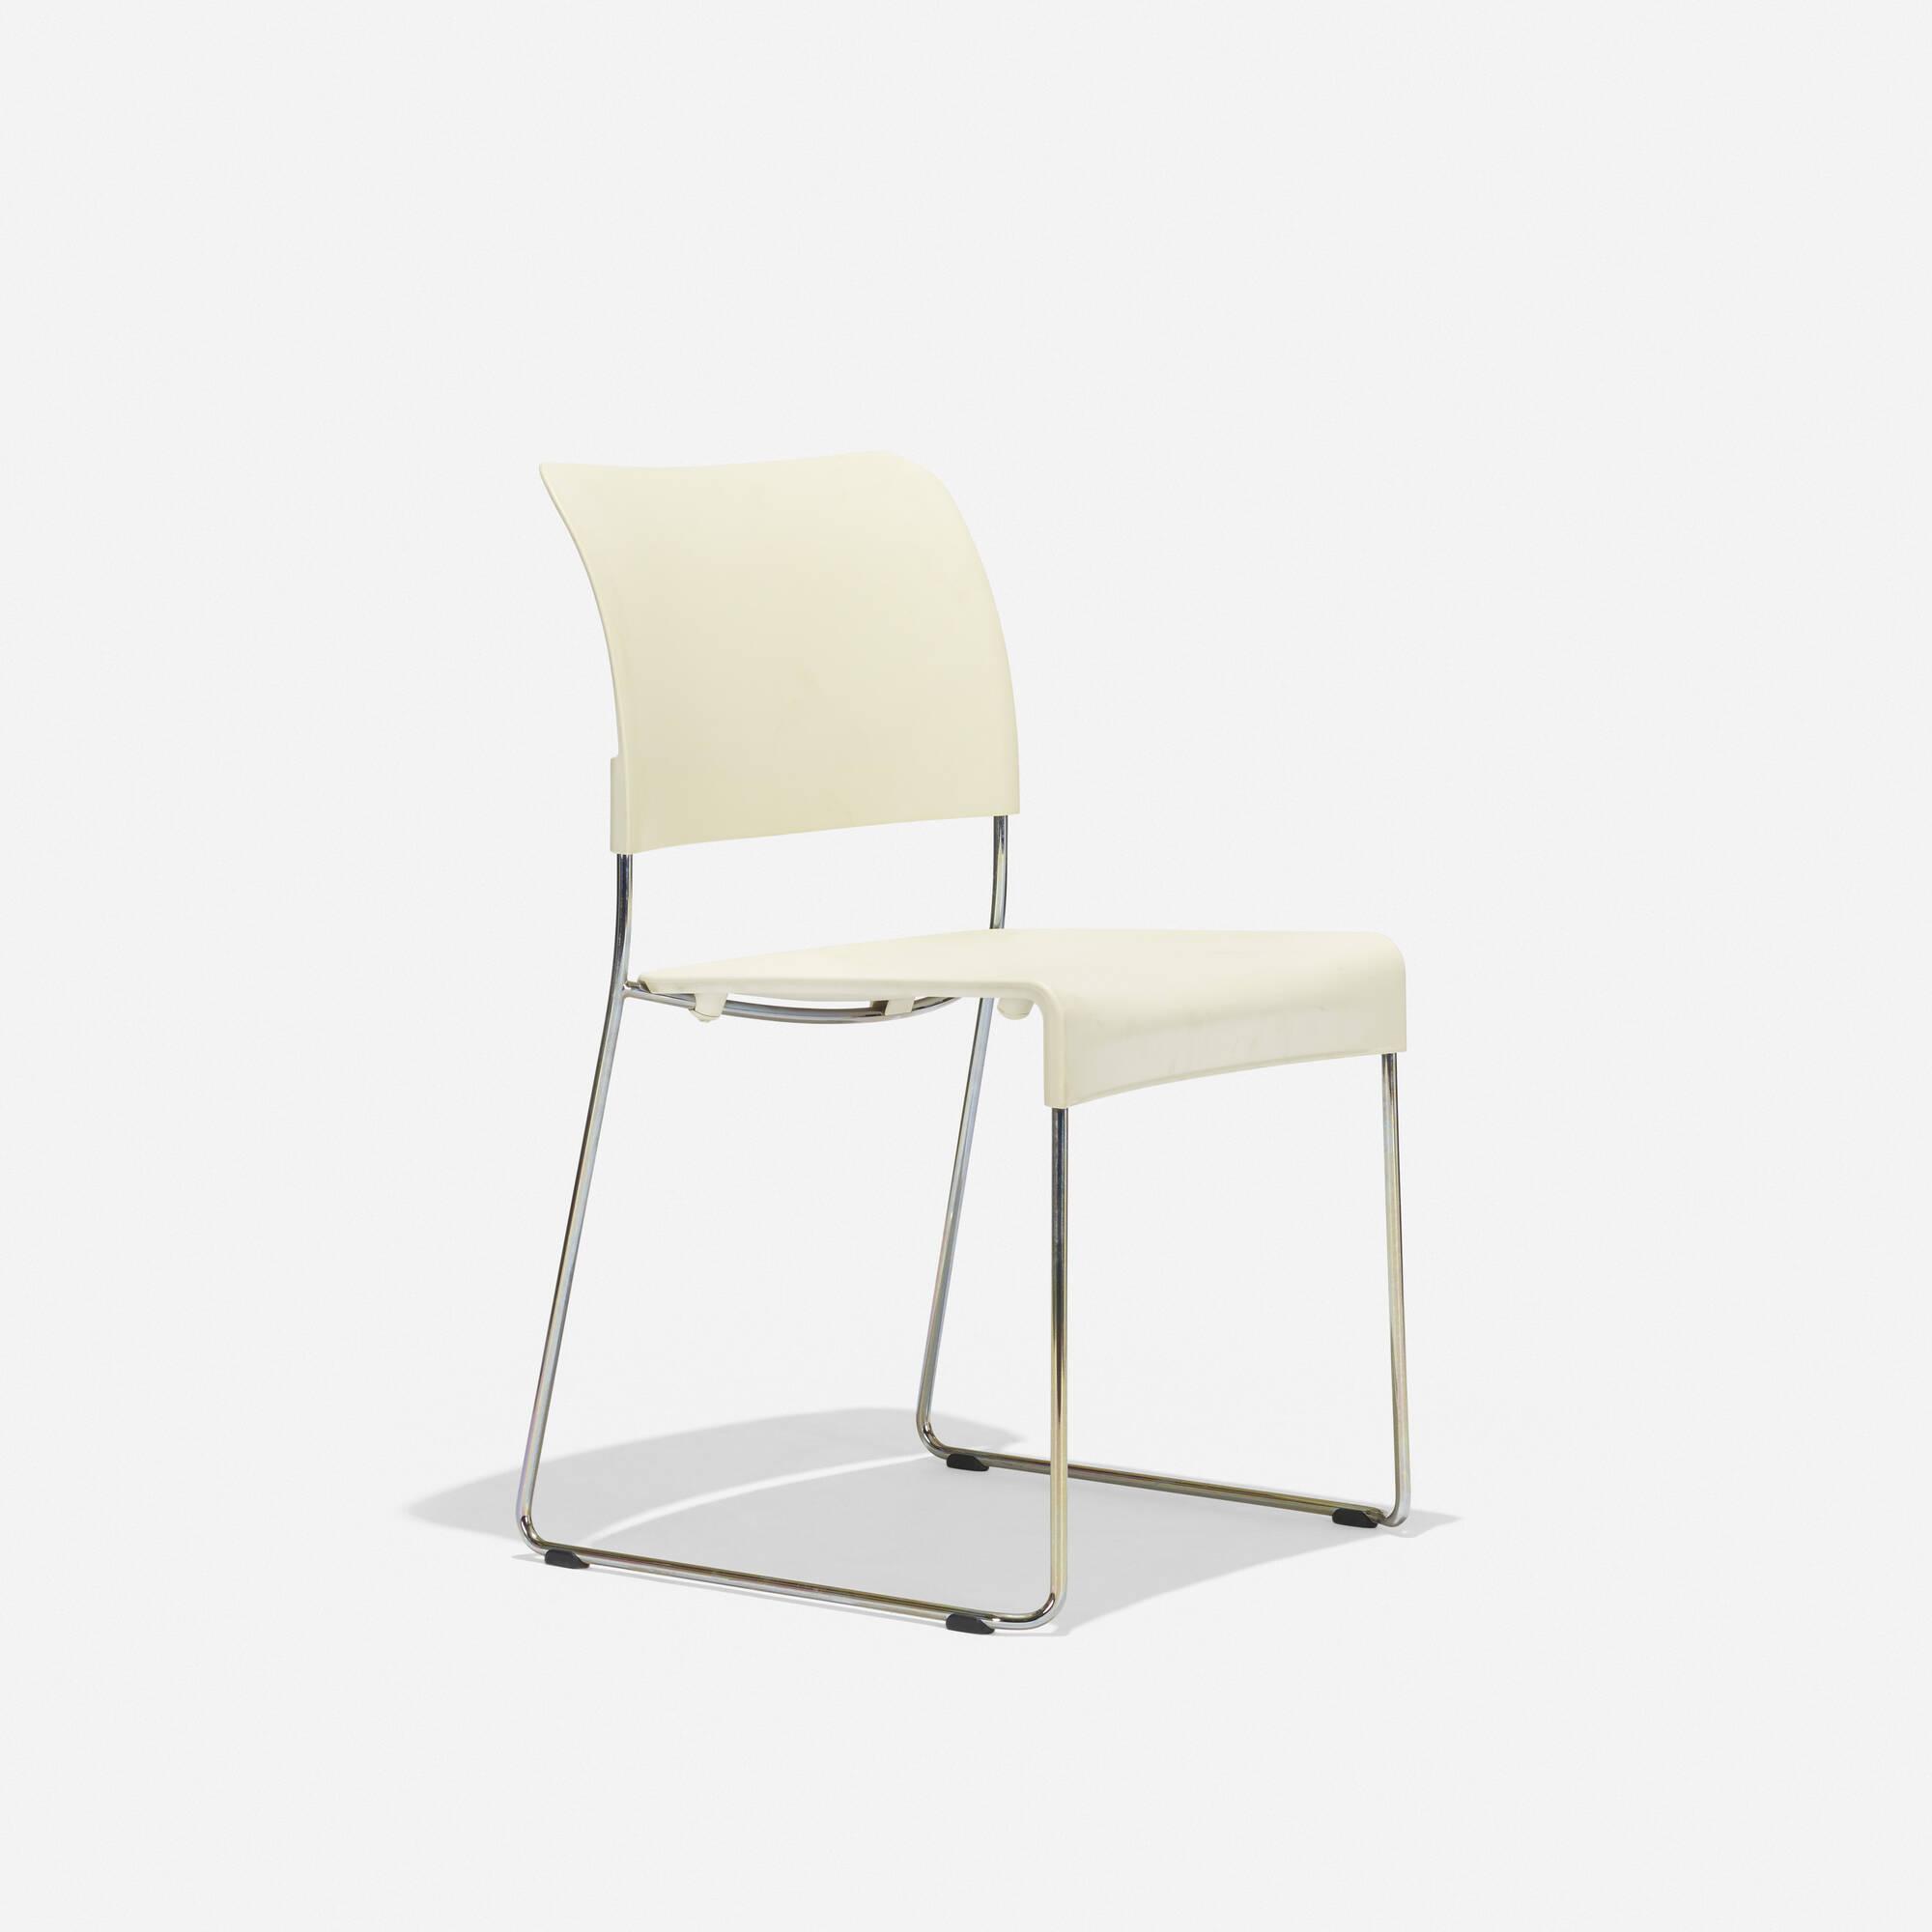 115: Jasper Morrison / Sim chair (1 of 3)